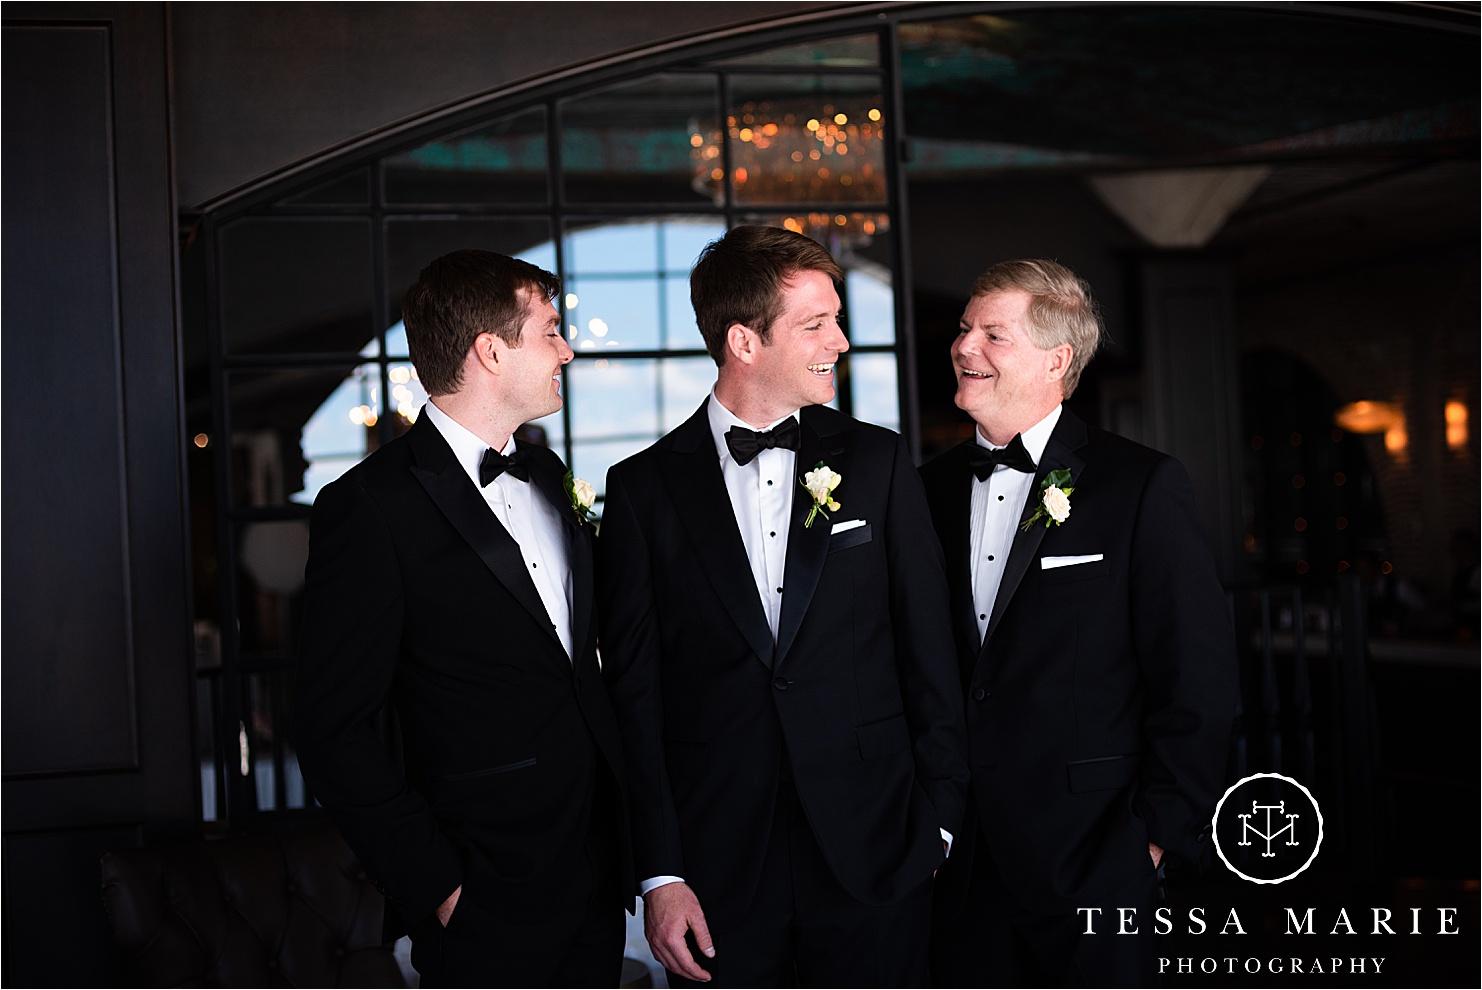 Tessa_marie_weddings_houston_wedding_photographer_The_astorian_0098.jpg